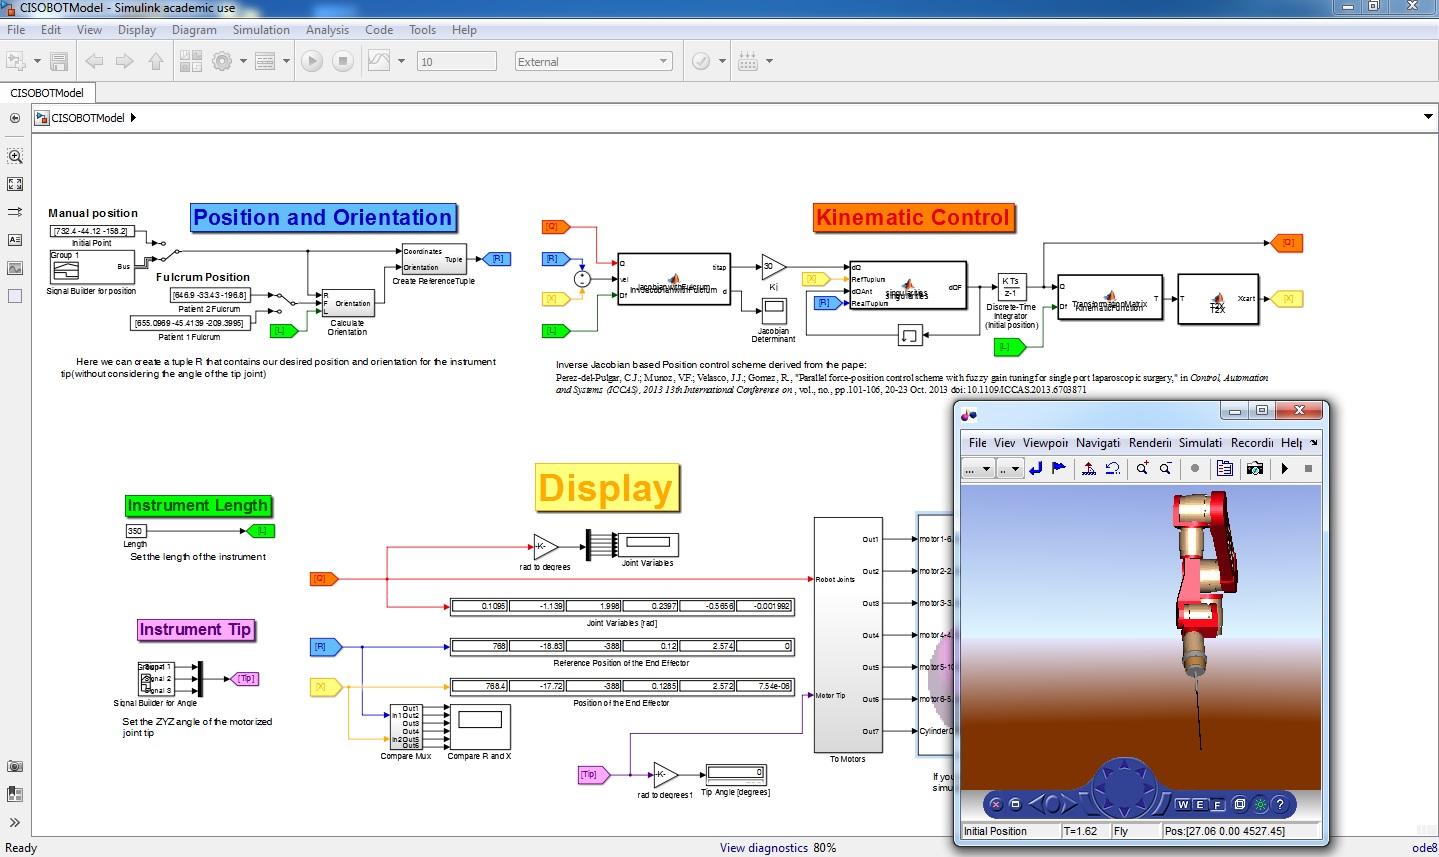 6dof Simulation